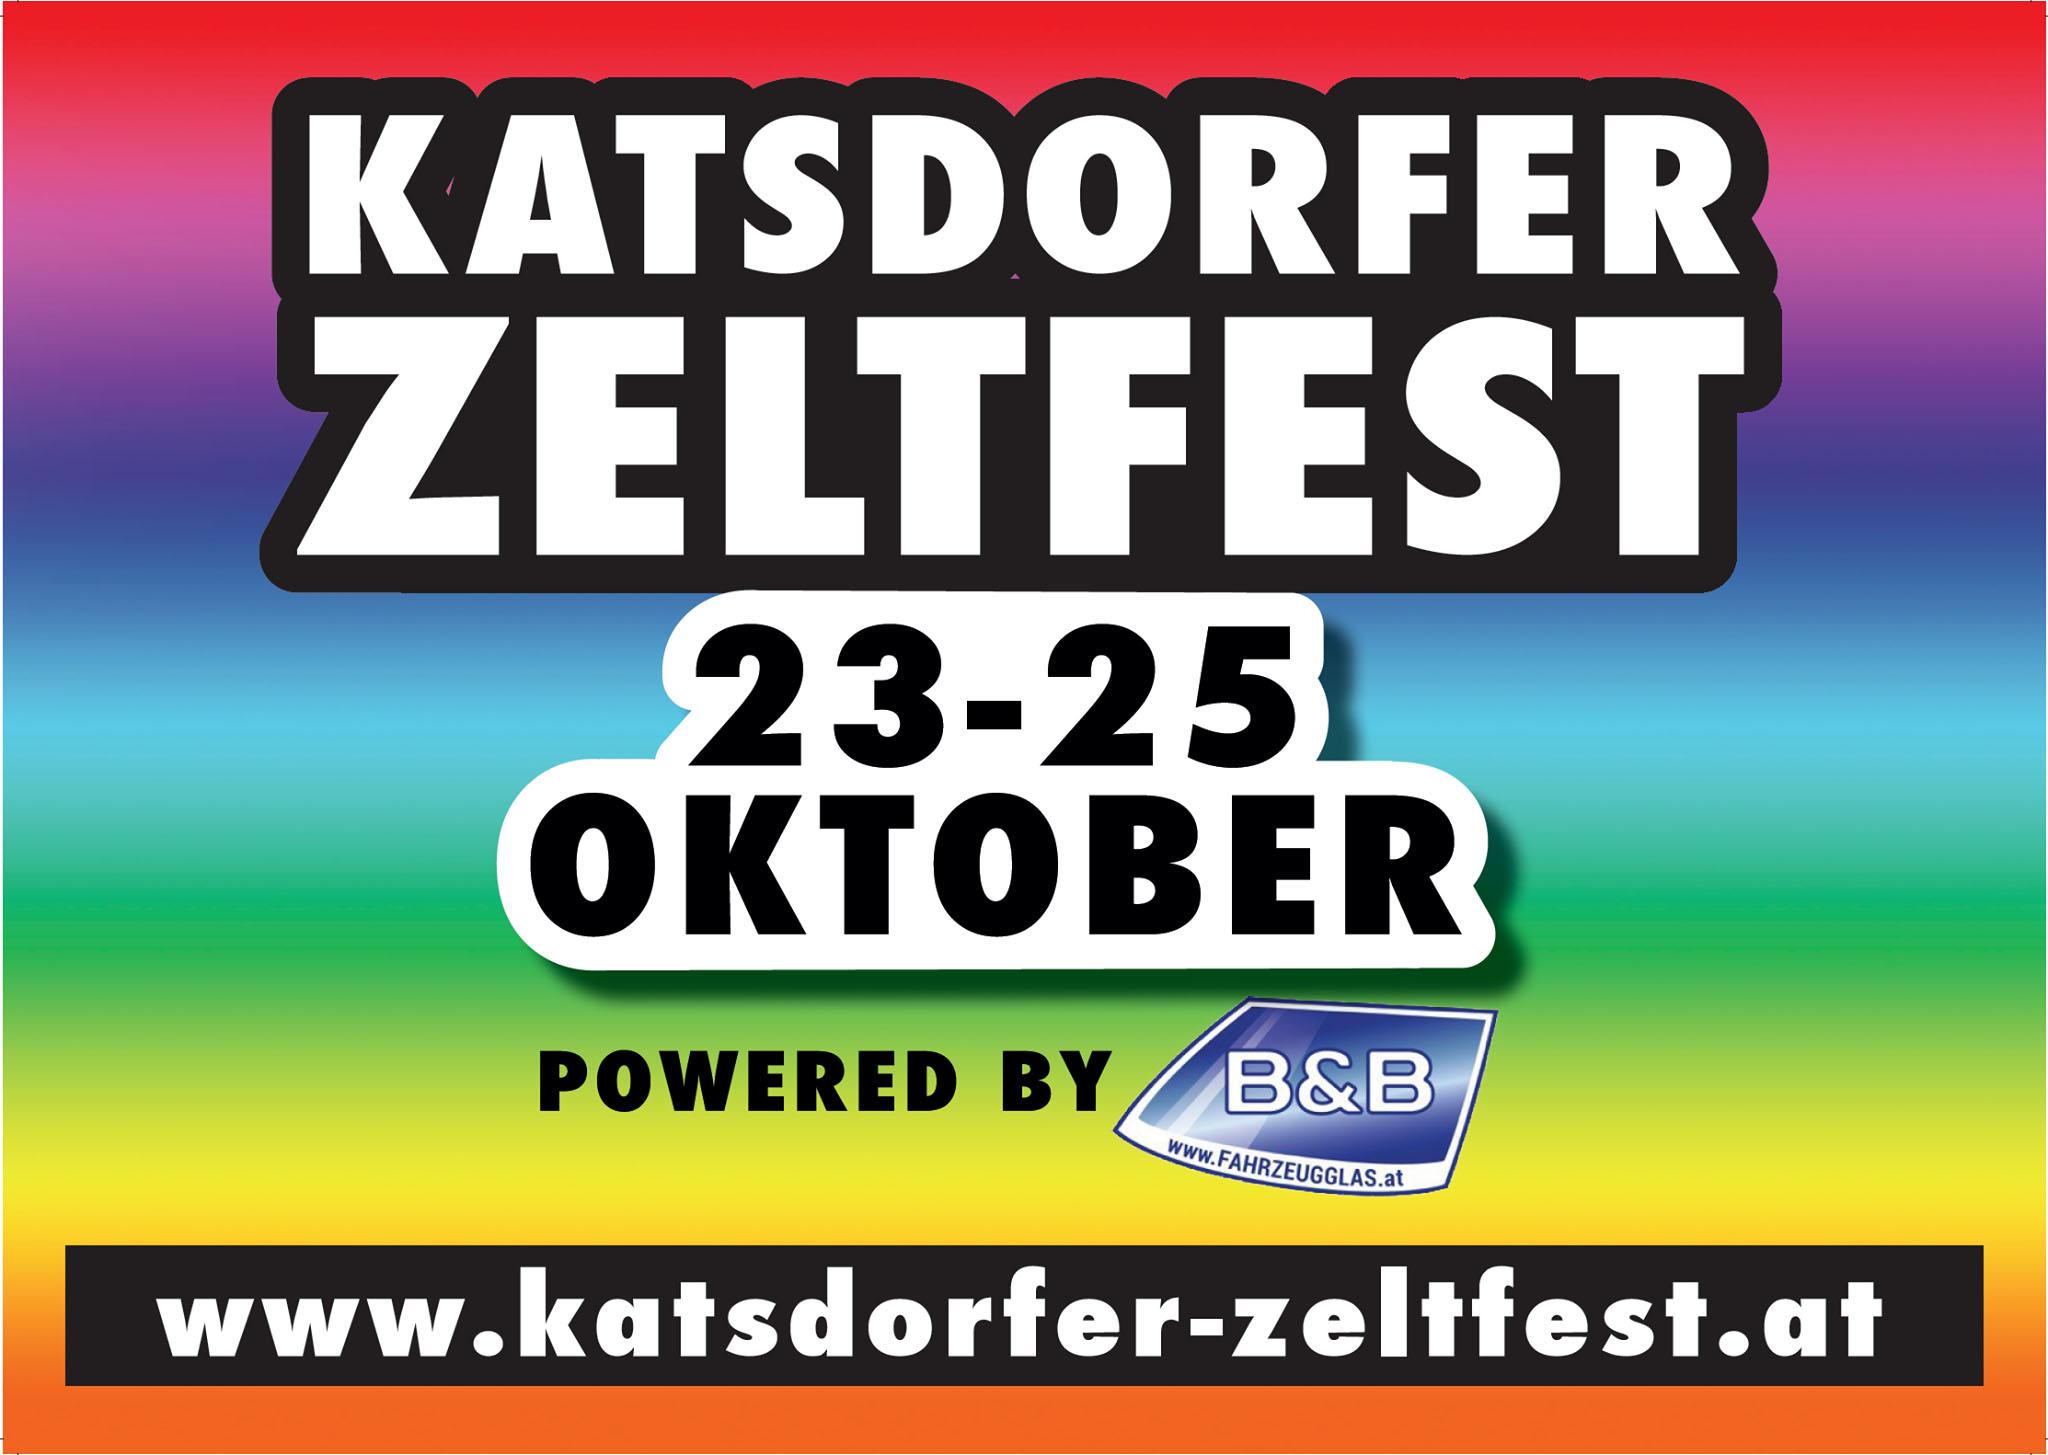 Katsdorfer Zeltfest 2020